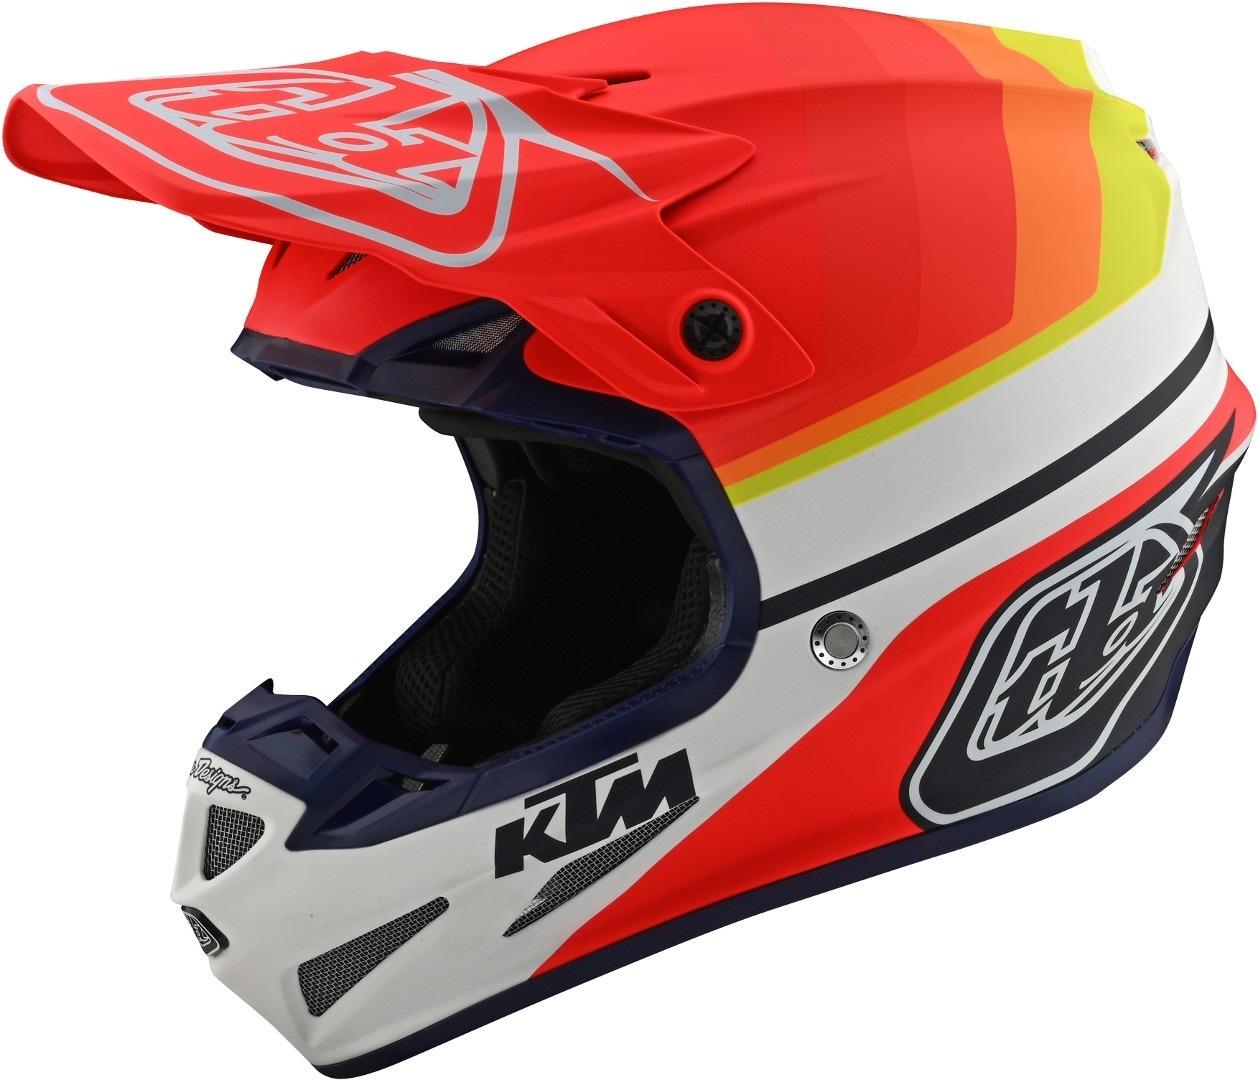 Troy Lee Designs SE4 KTM Mirage MIPS Motocross Helm, weiss-rot, Größe XL, weiss-rot, Größe XL